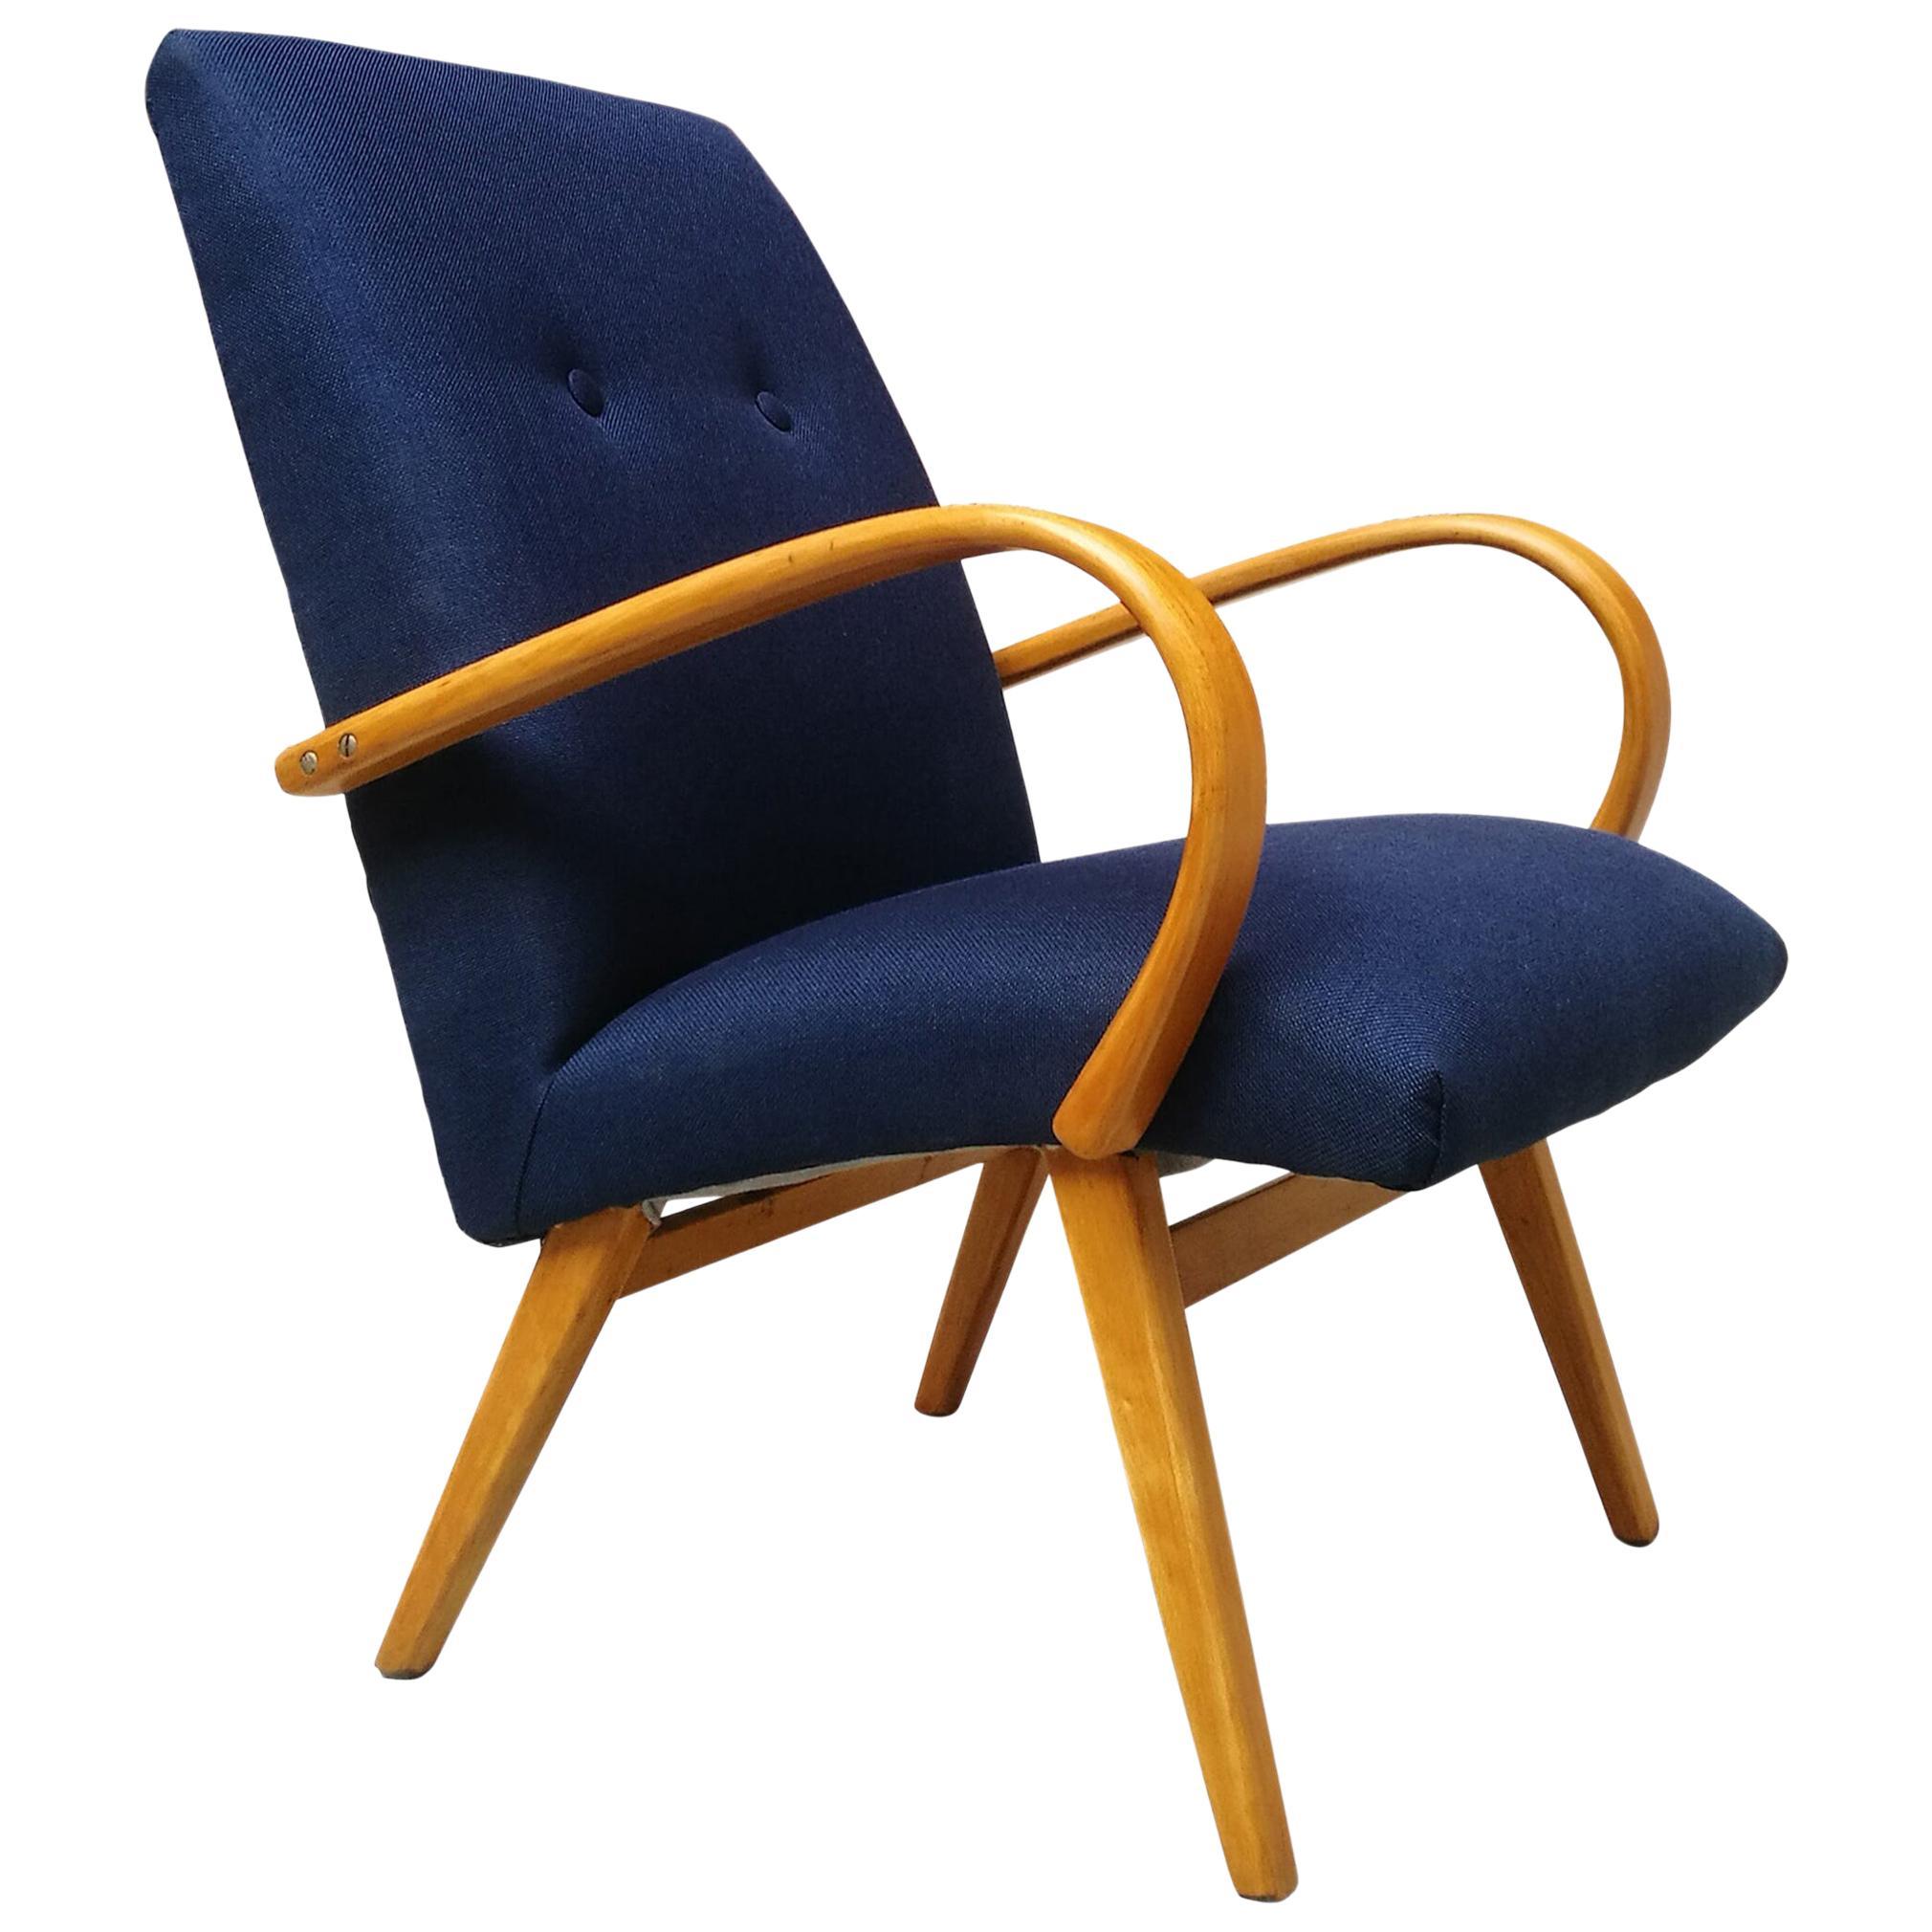 Danish Beech and Blue Cotton, Restored Armchair, 1960s